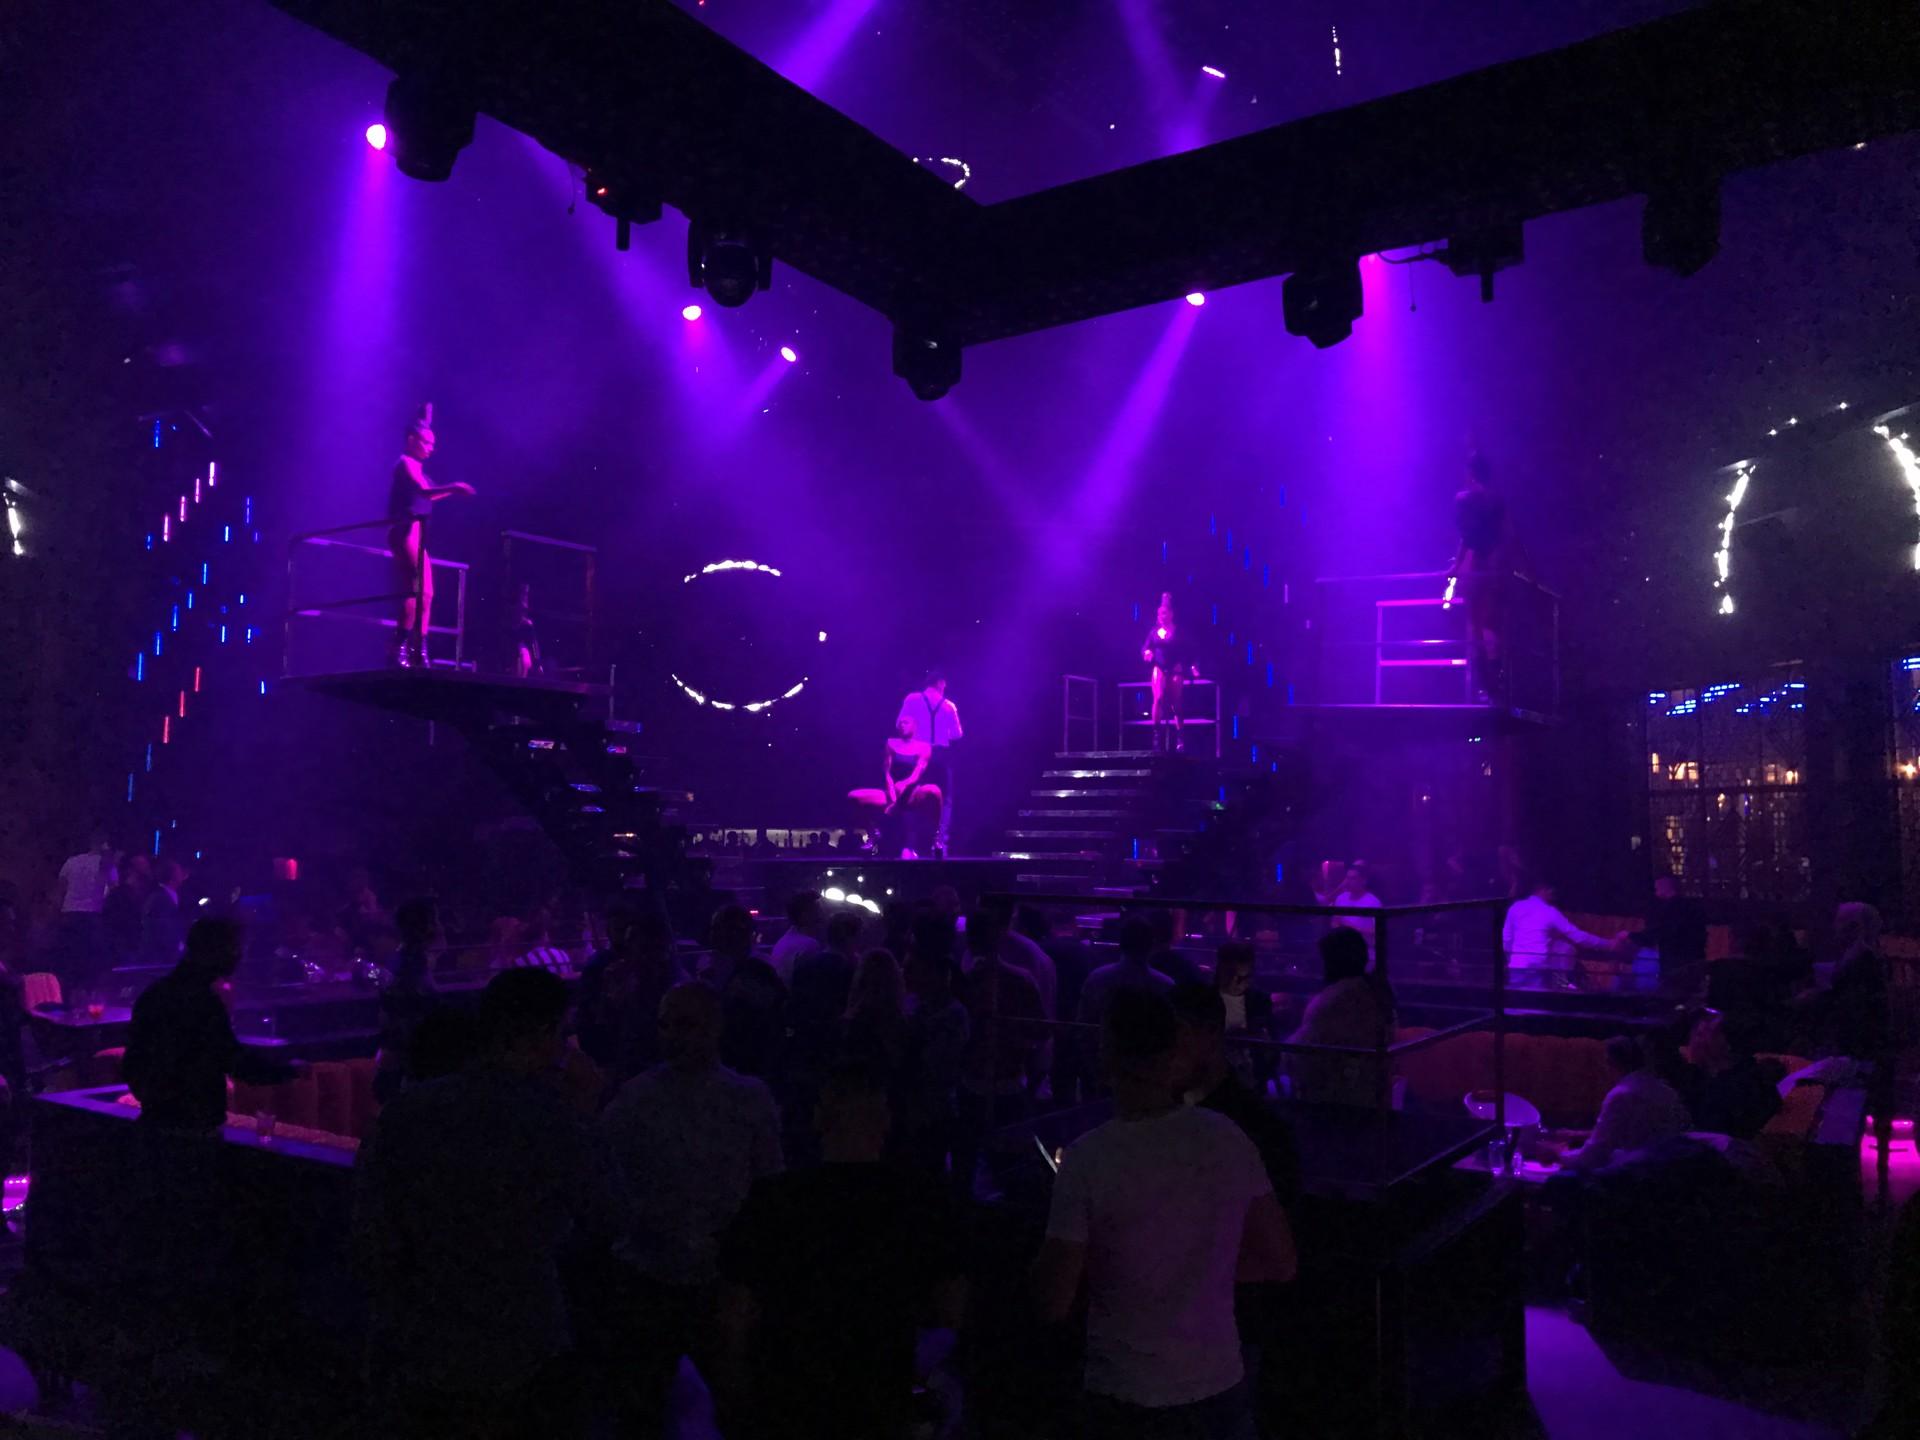 discoteca-bamboo-club-0178991ee6d29a8562